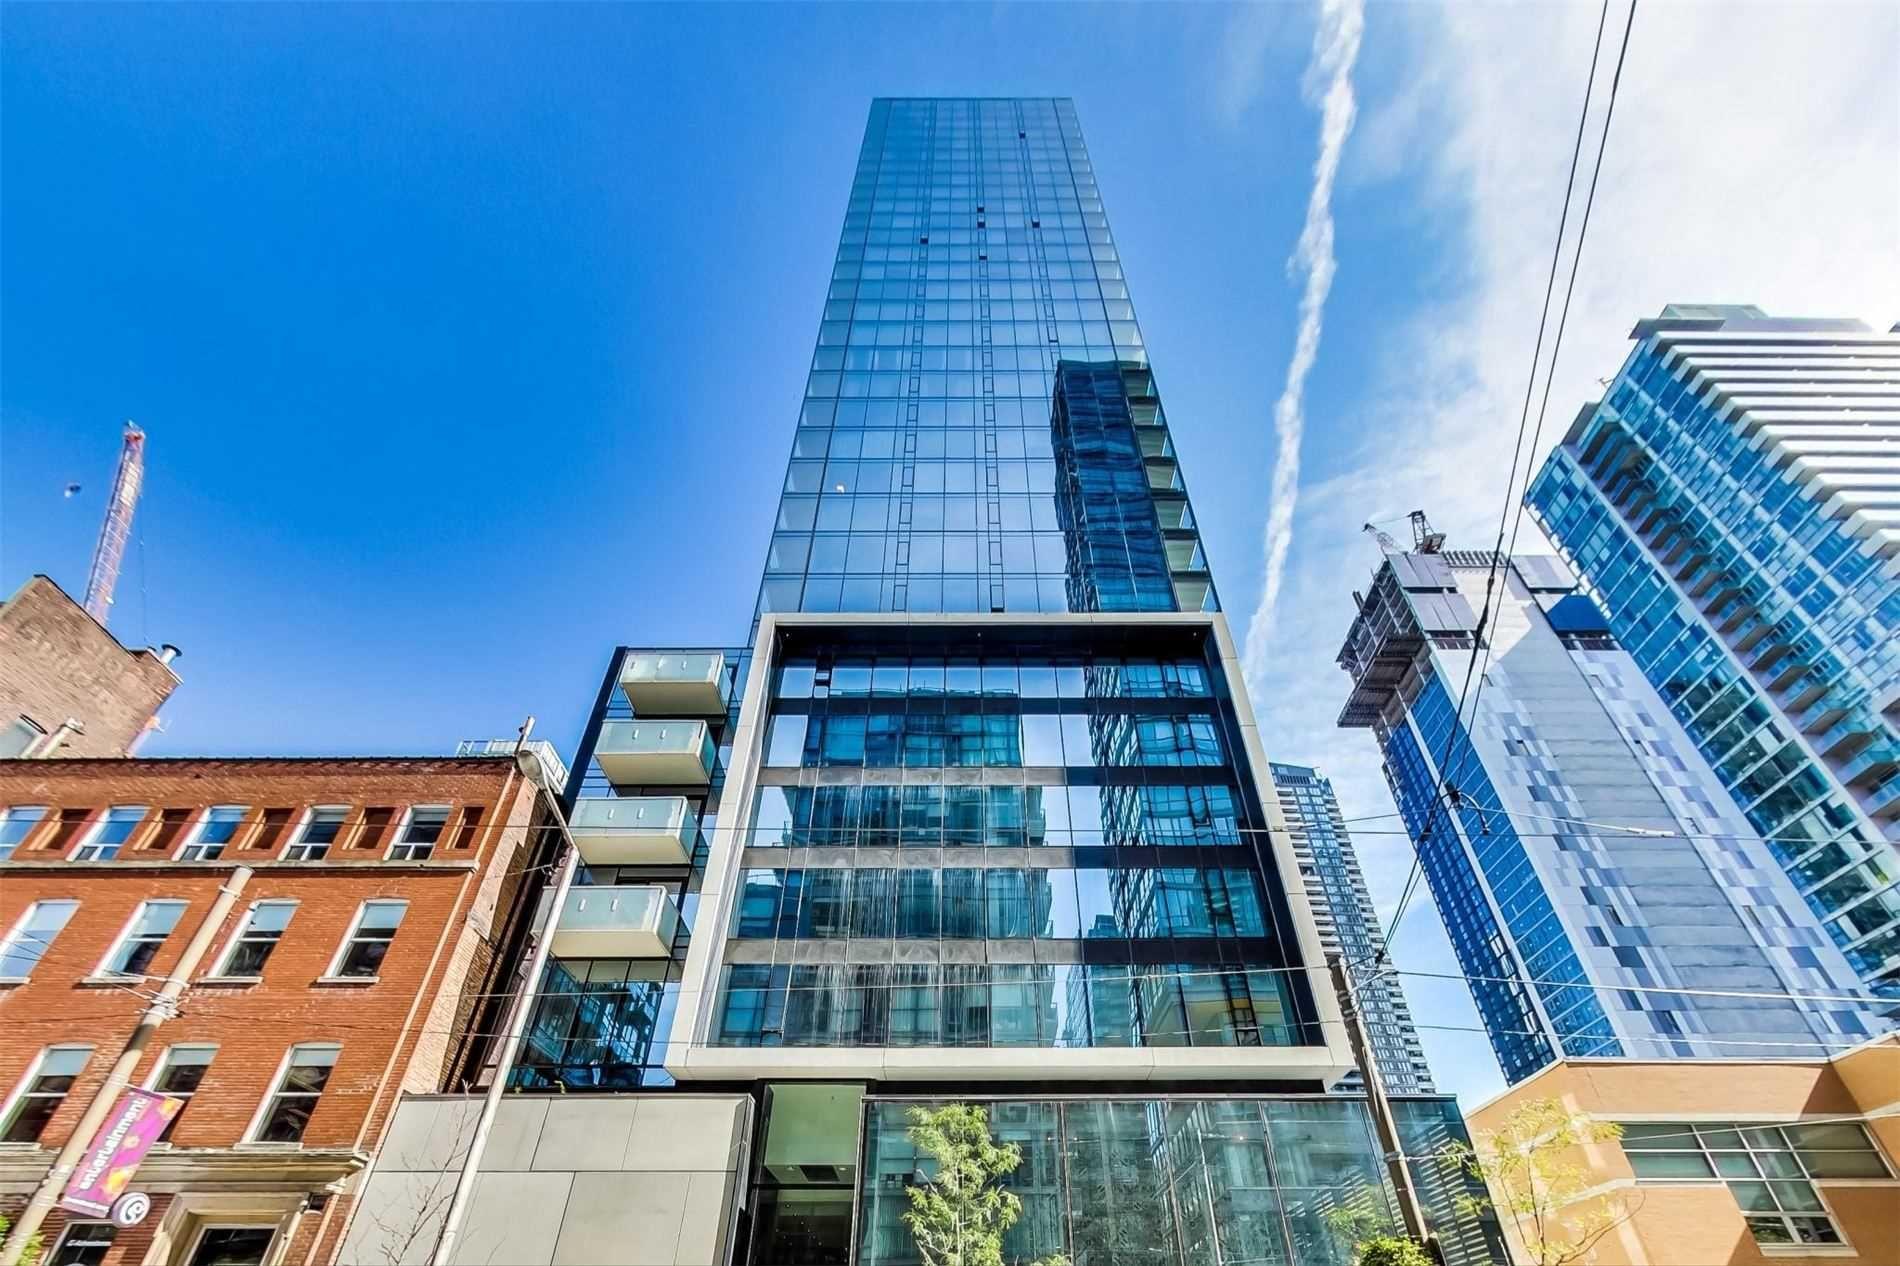 Main Photo: 2104 11 Charlotte Street in Toronto: Waterfront Communities C1 Condo for lease (Toronto C01)  : MLS®# C5392629